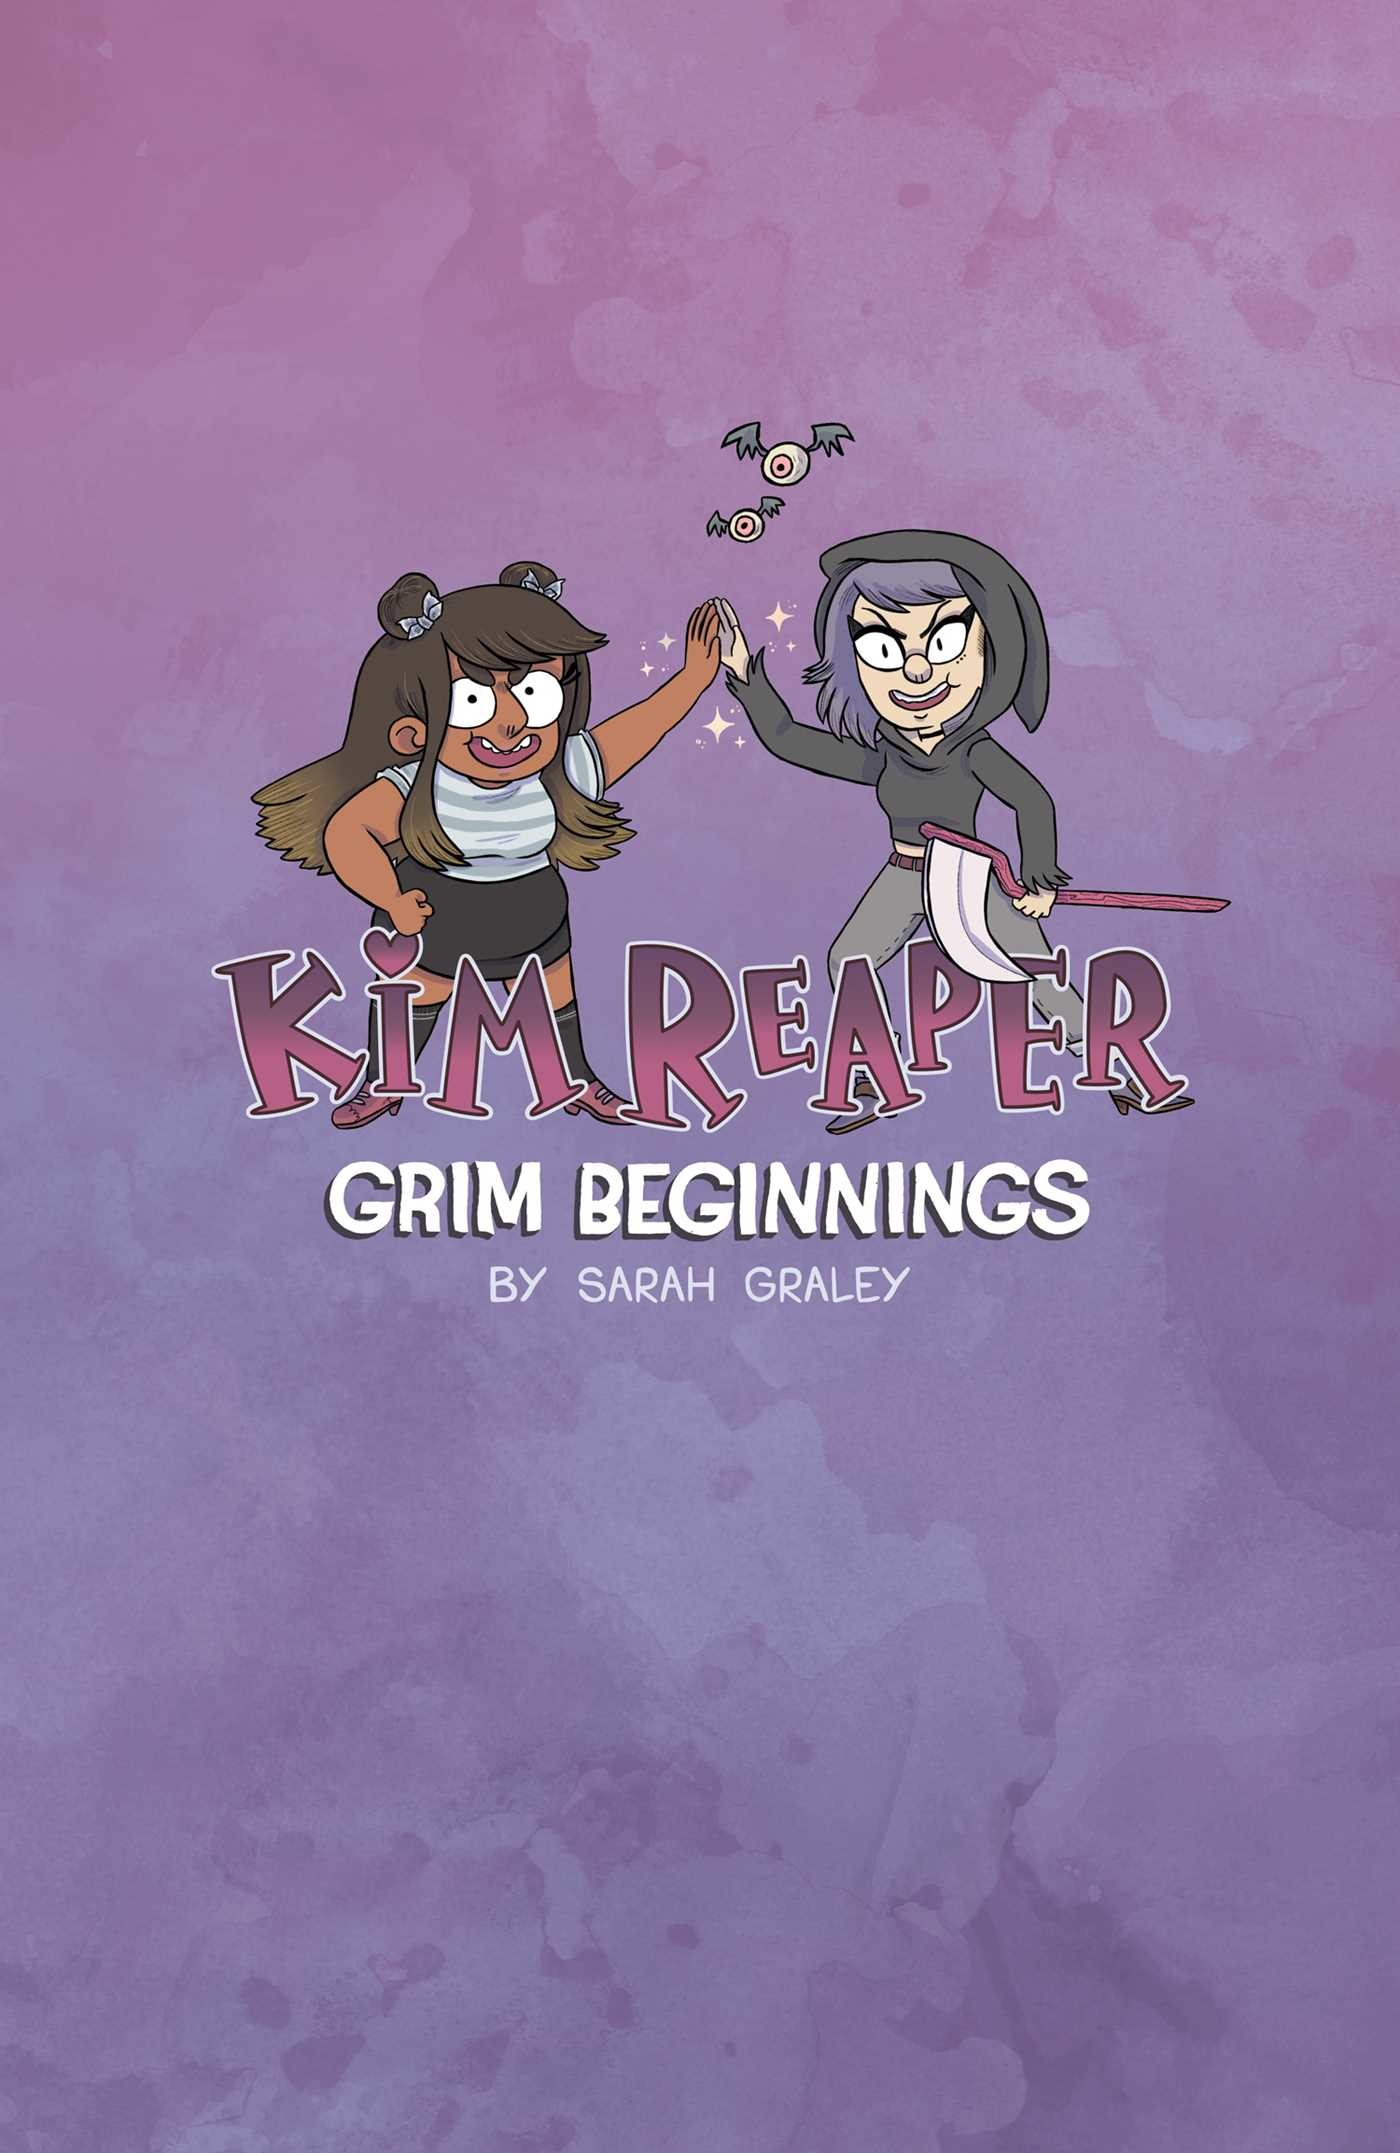 Kim reaper vol 1 9781620104552.in01